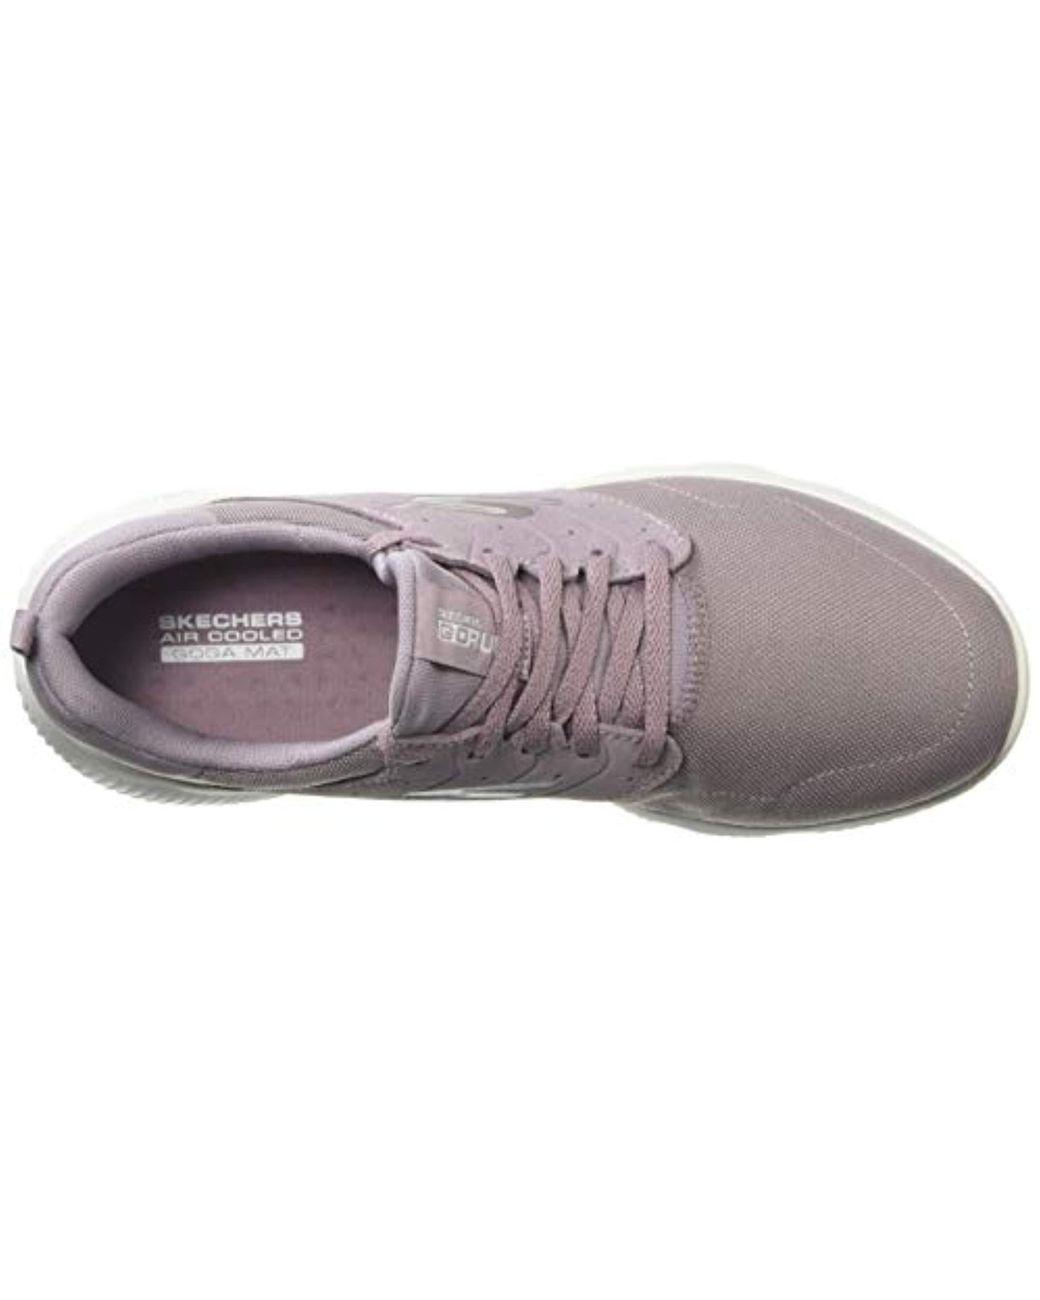 075e7b2563636 Women's Purple S 15161 Go Run Focus